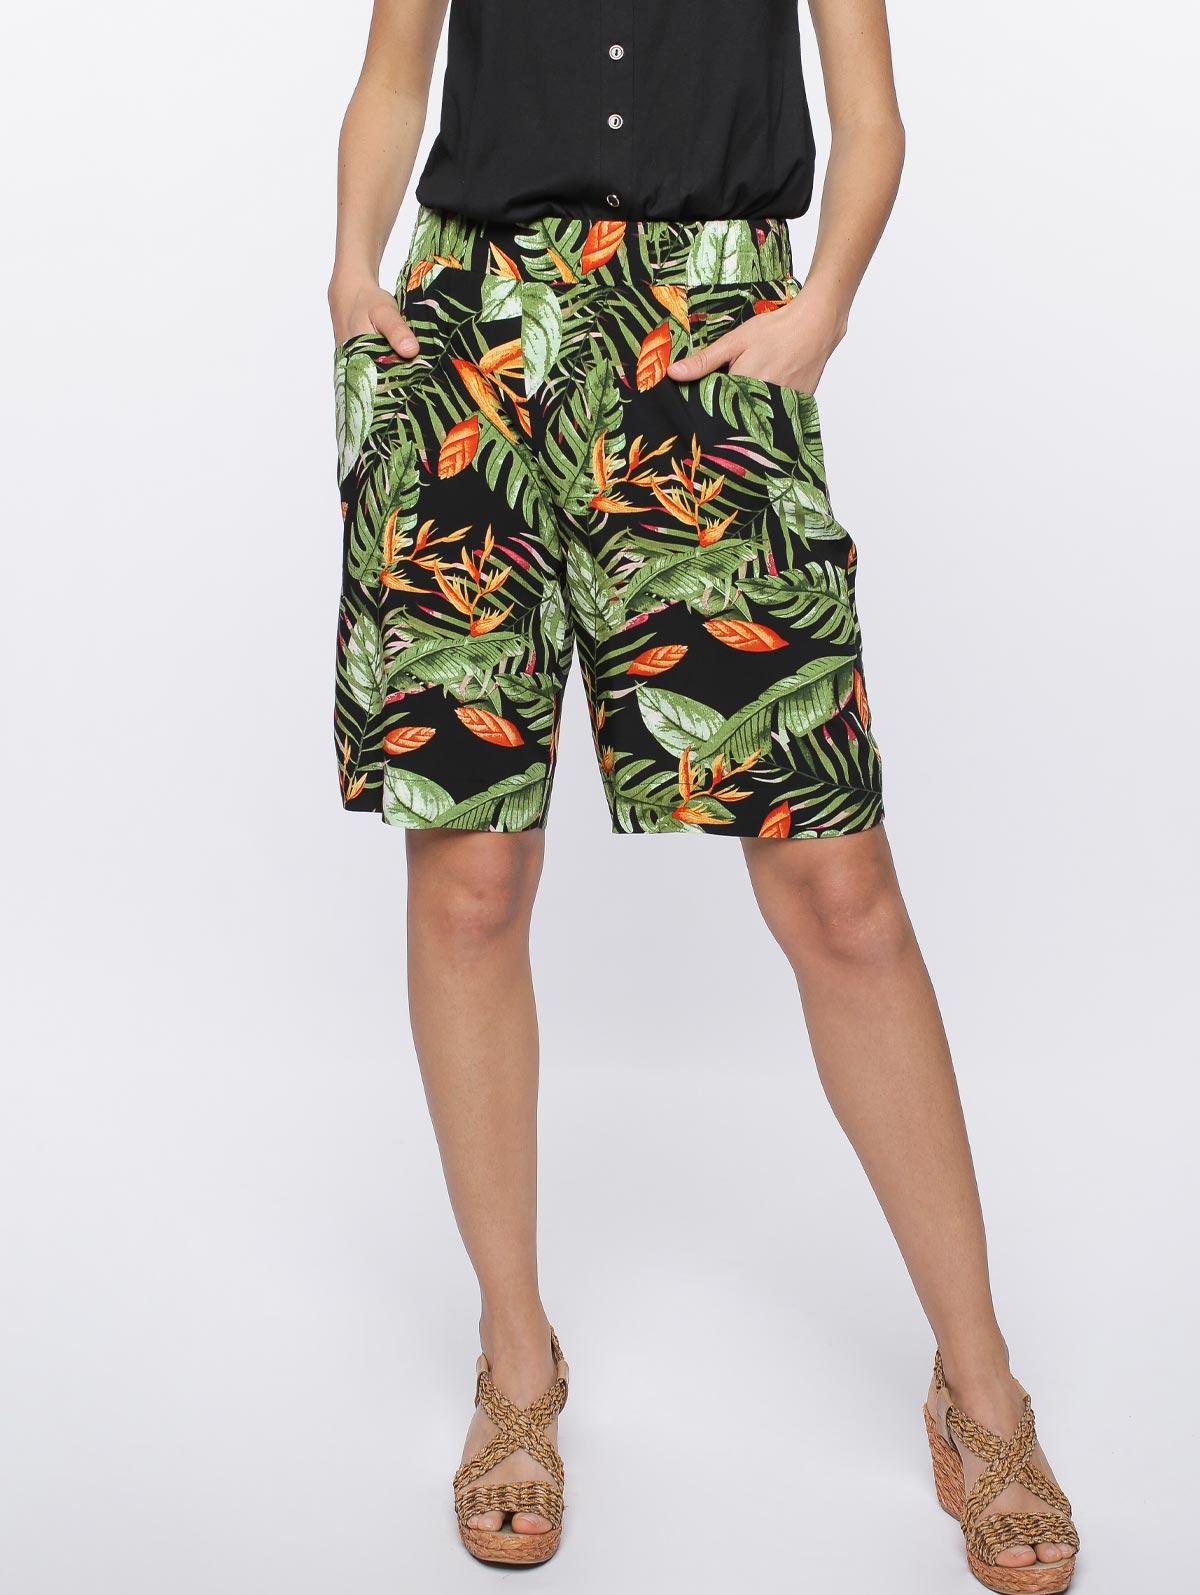 Bermuda imprimé tropical poches